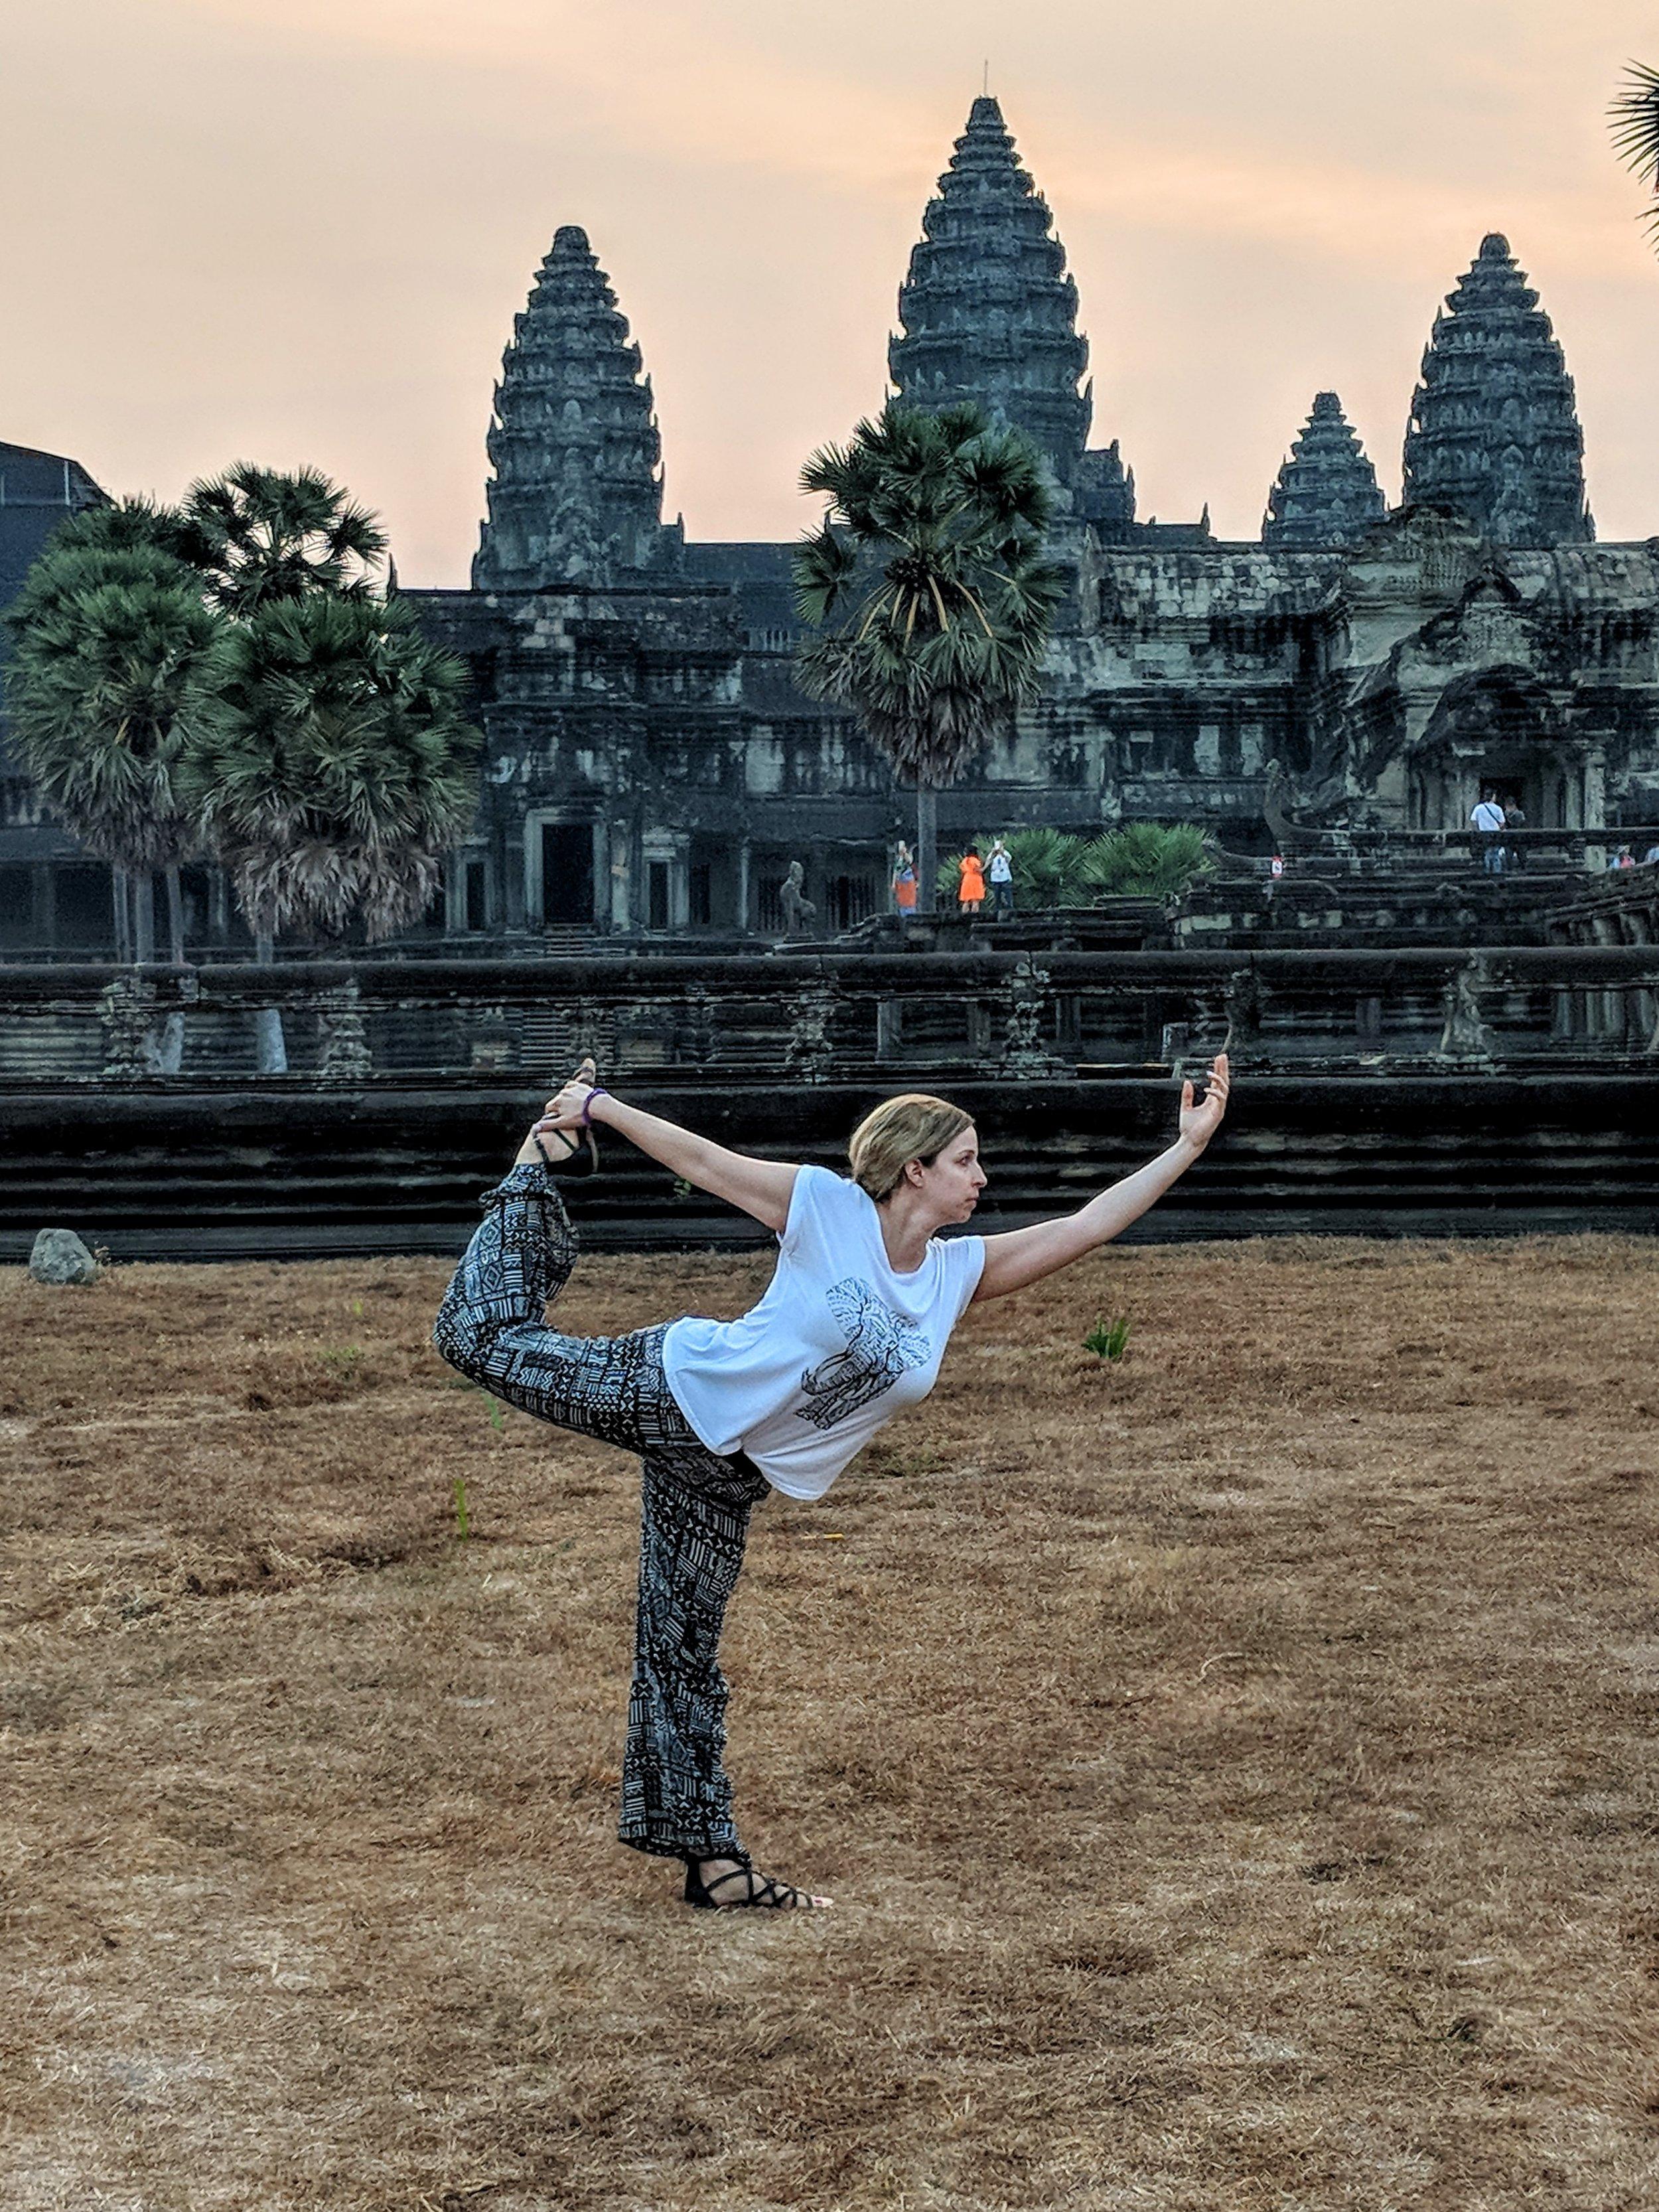 Retreat scouting in Cambodia - 2019